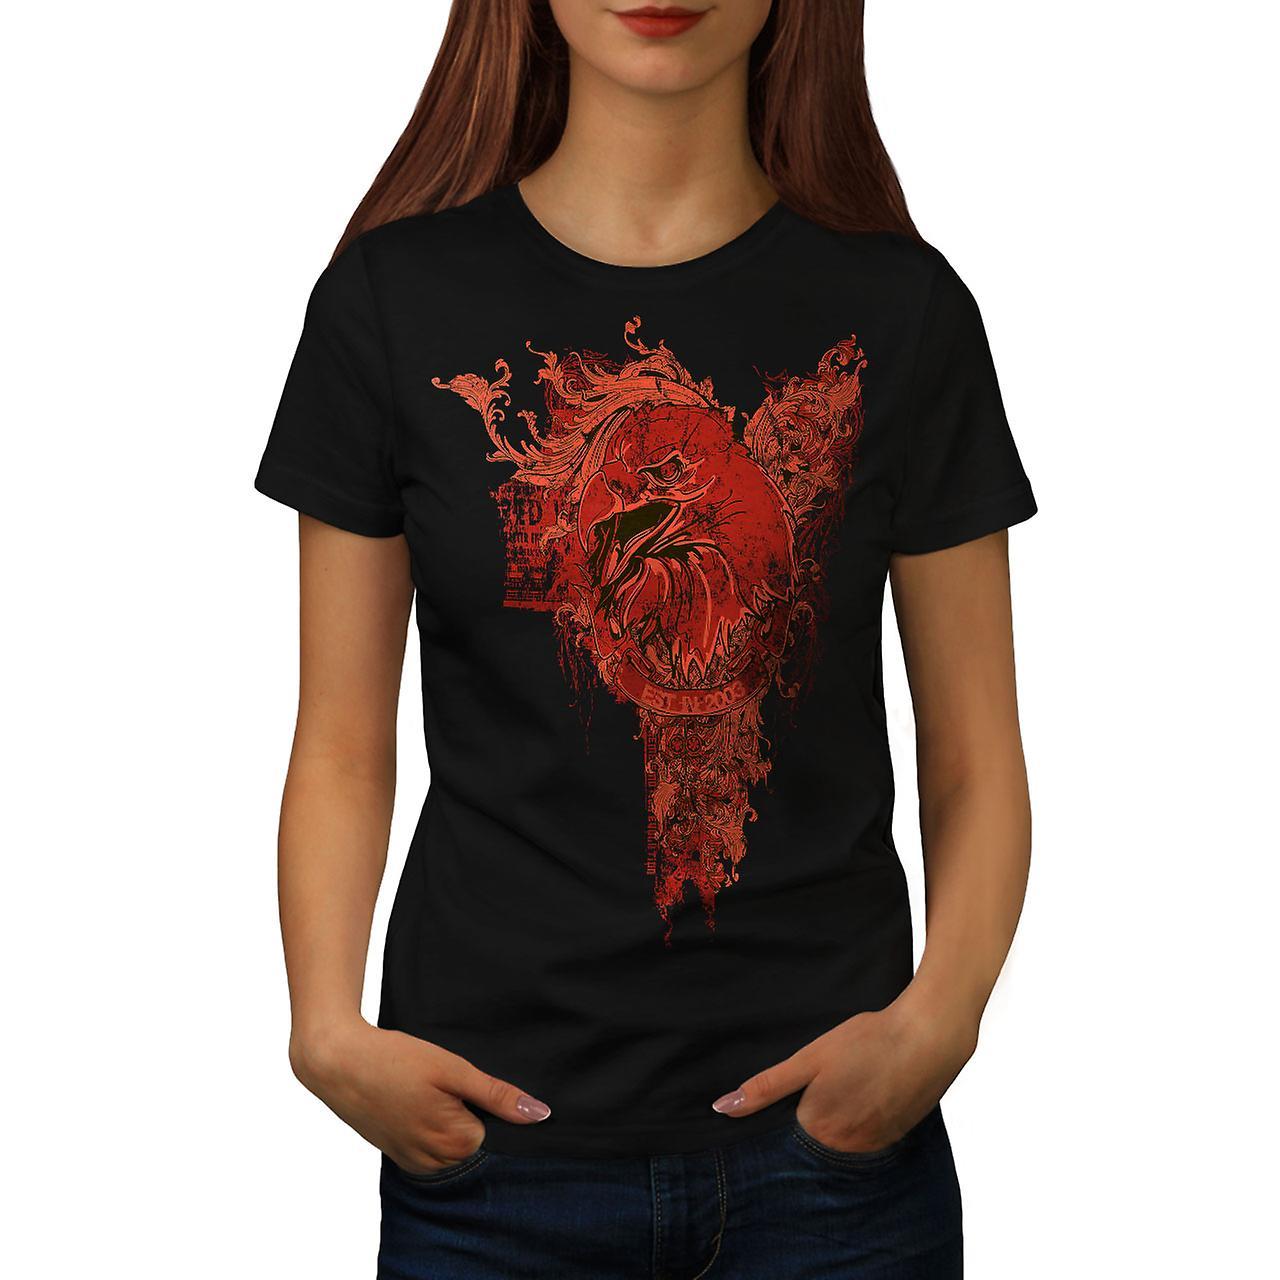 Grim Reaper Death Vintage Women Black T-shirt | Wellcoda